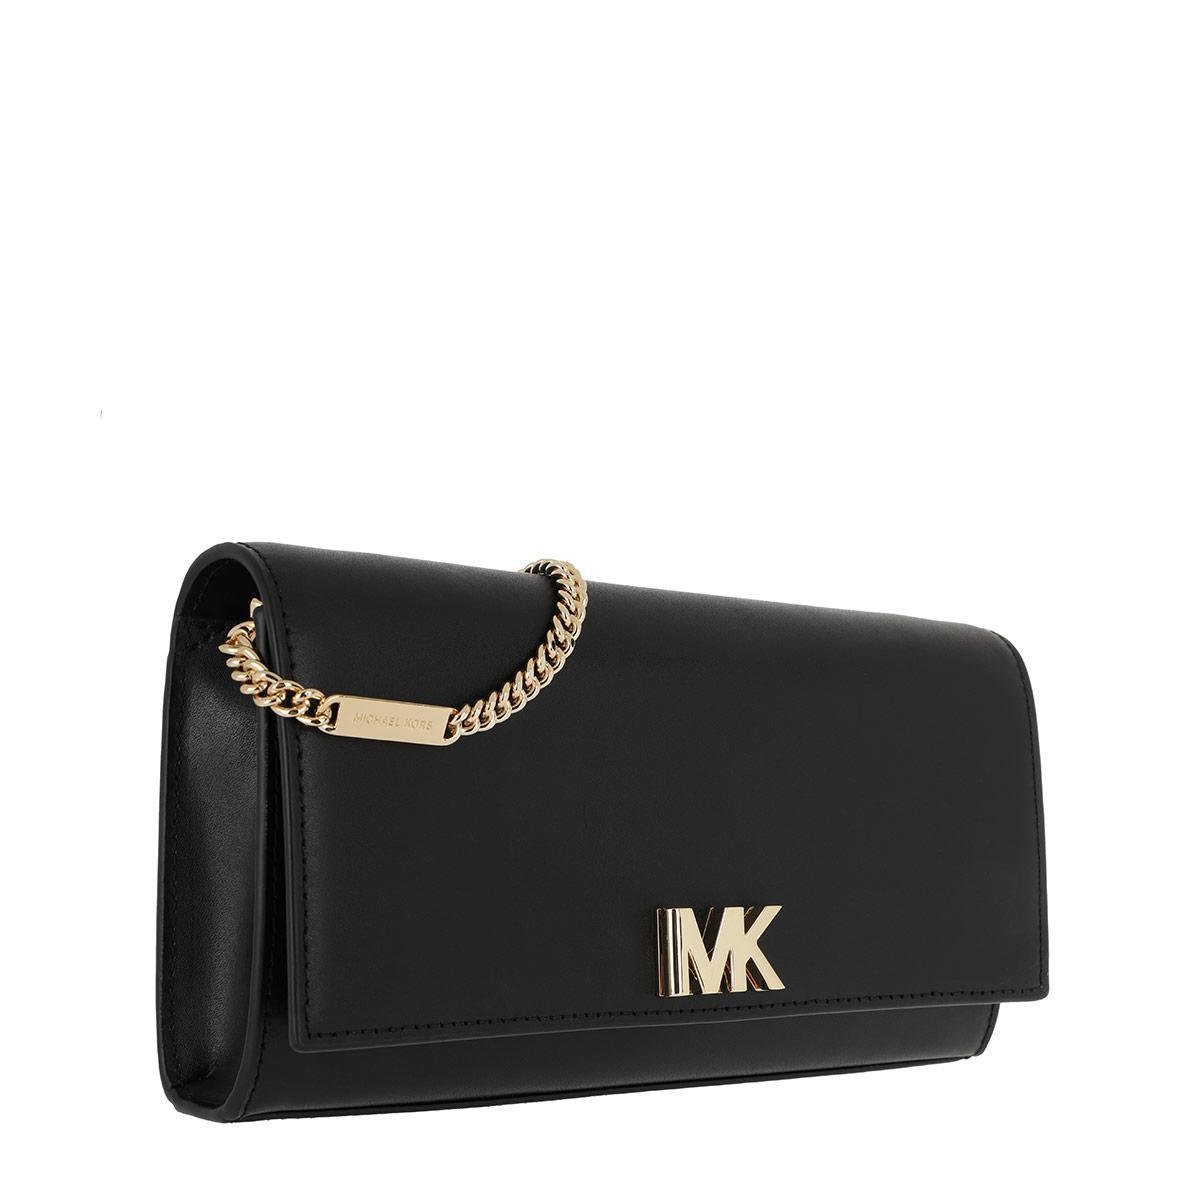 Michael Kors Leather Mott Lg Ew Clutch Black